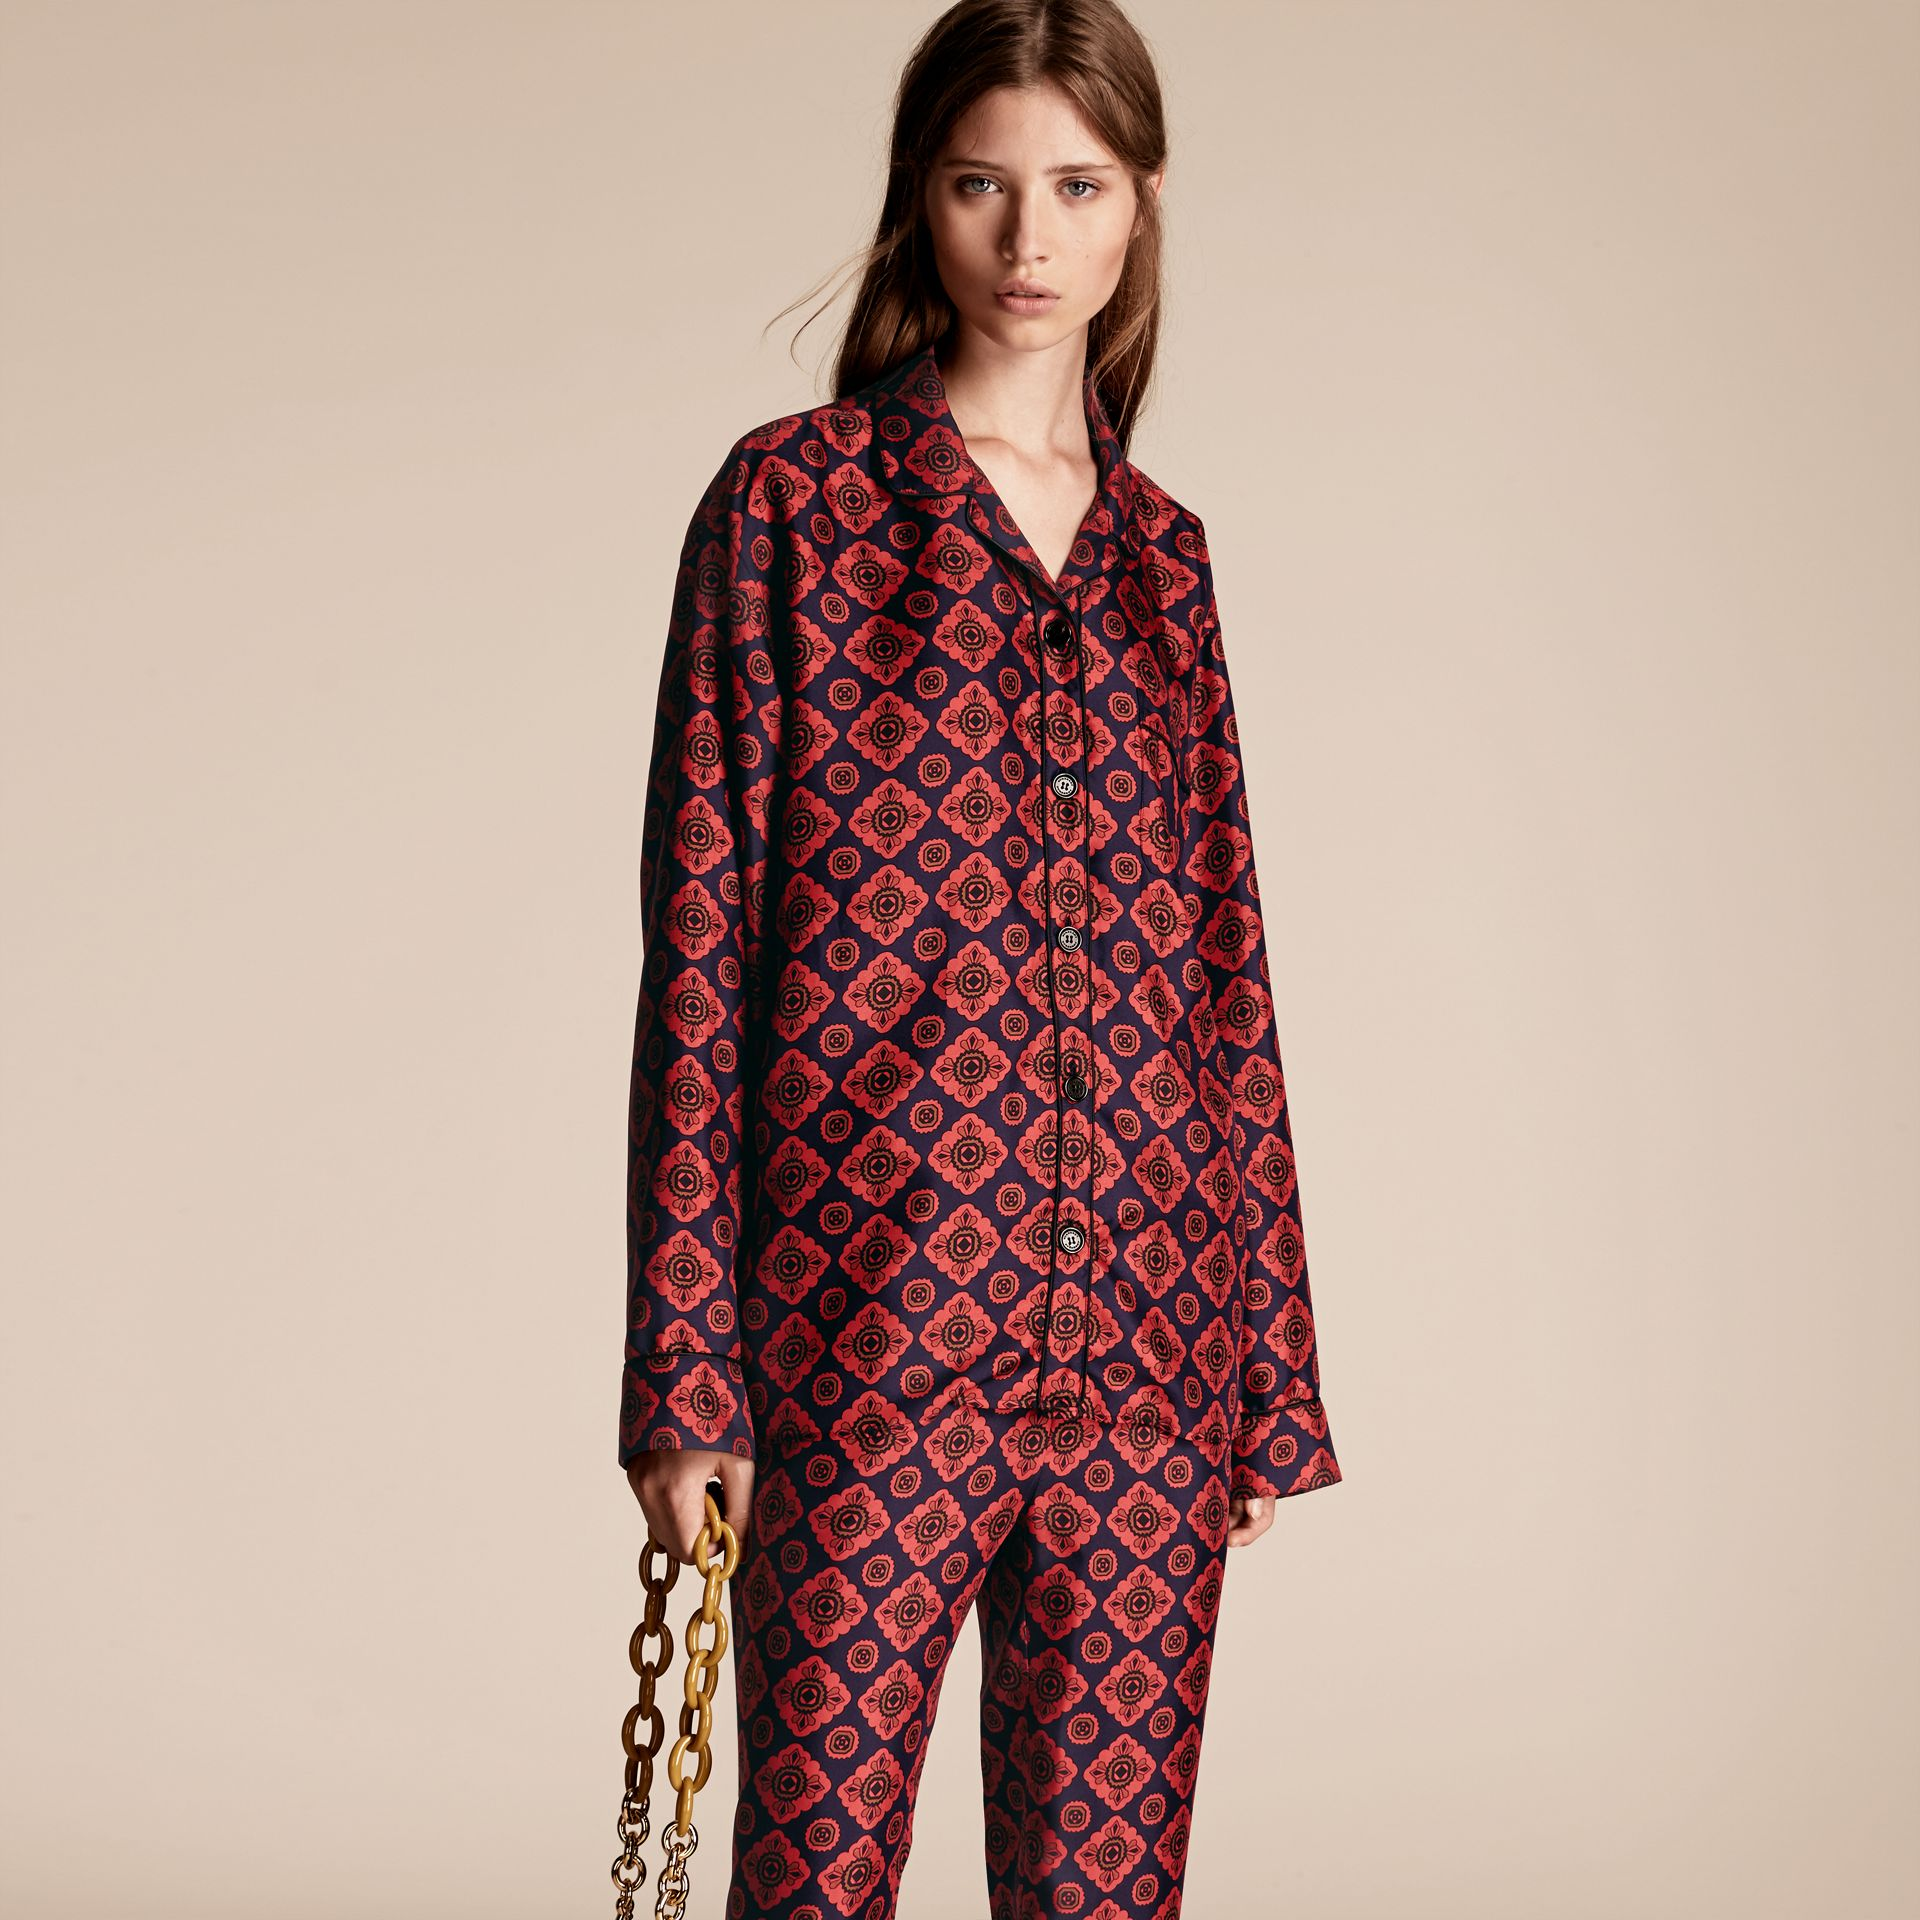 Geometric Tile Print Silk Pyjama-style Shirt - gallery image 1